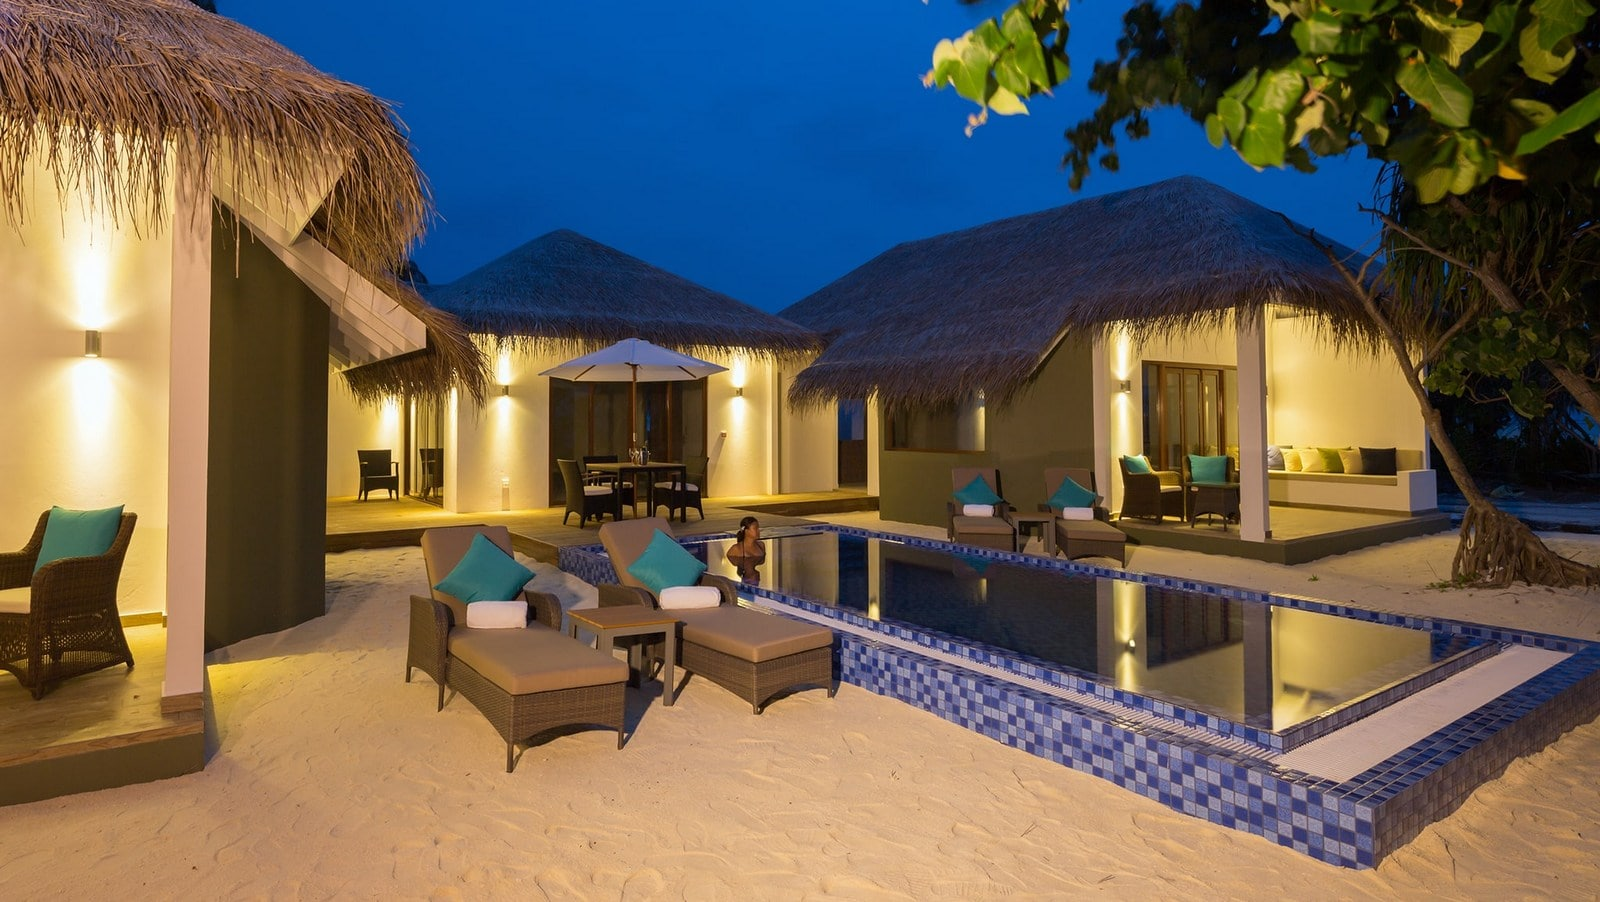 Мальдивы, отель Cocoon Maldives, номер Cocoon Suite Two Bed Room